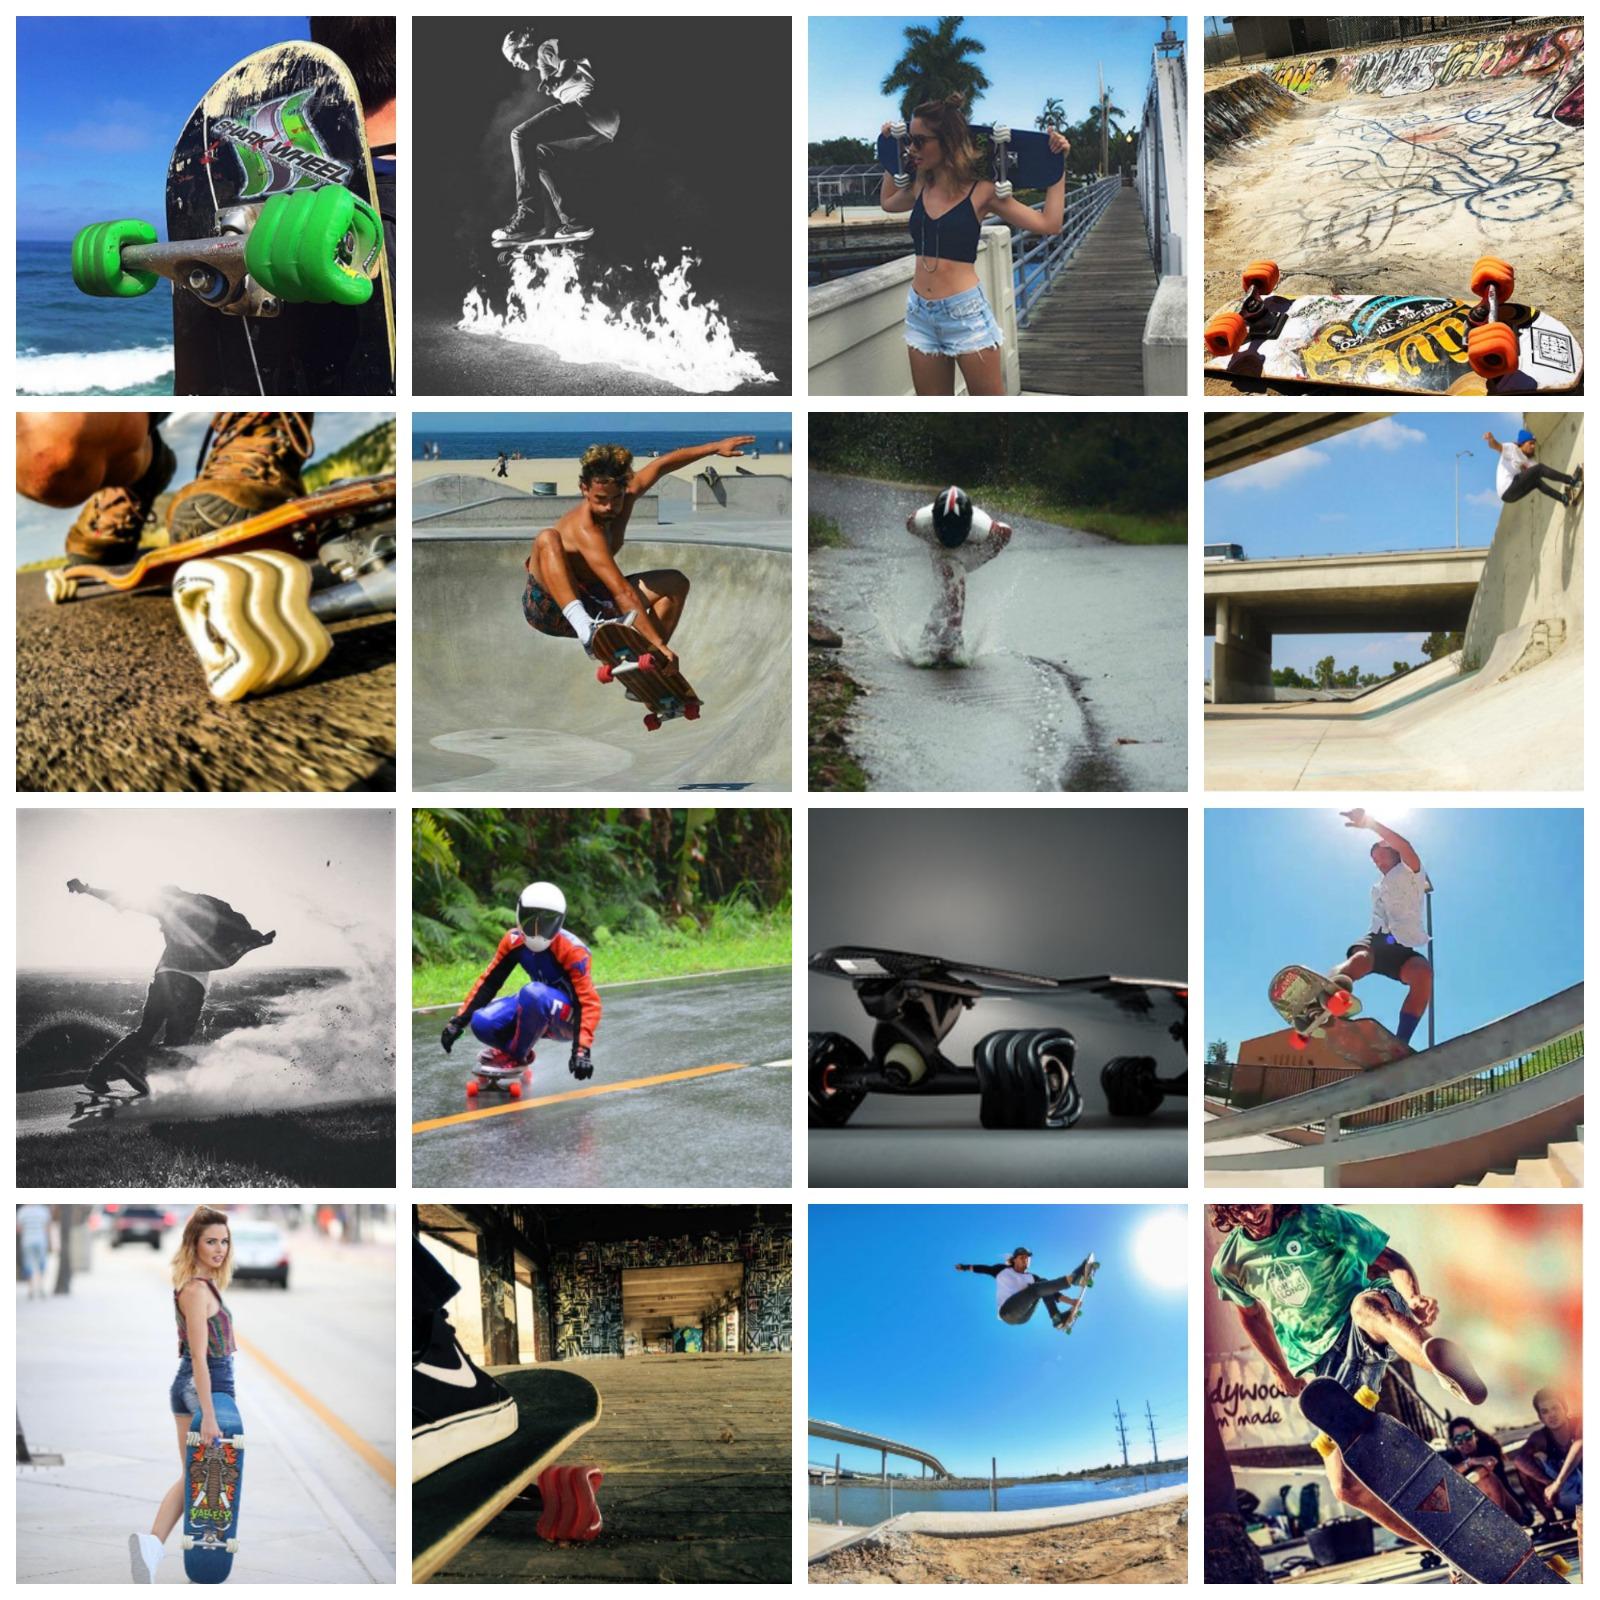 "Fiesta 22"" Skateboard By Shark Wheel (50% Off - Click the Listing)"